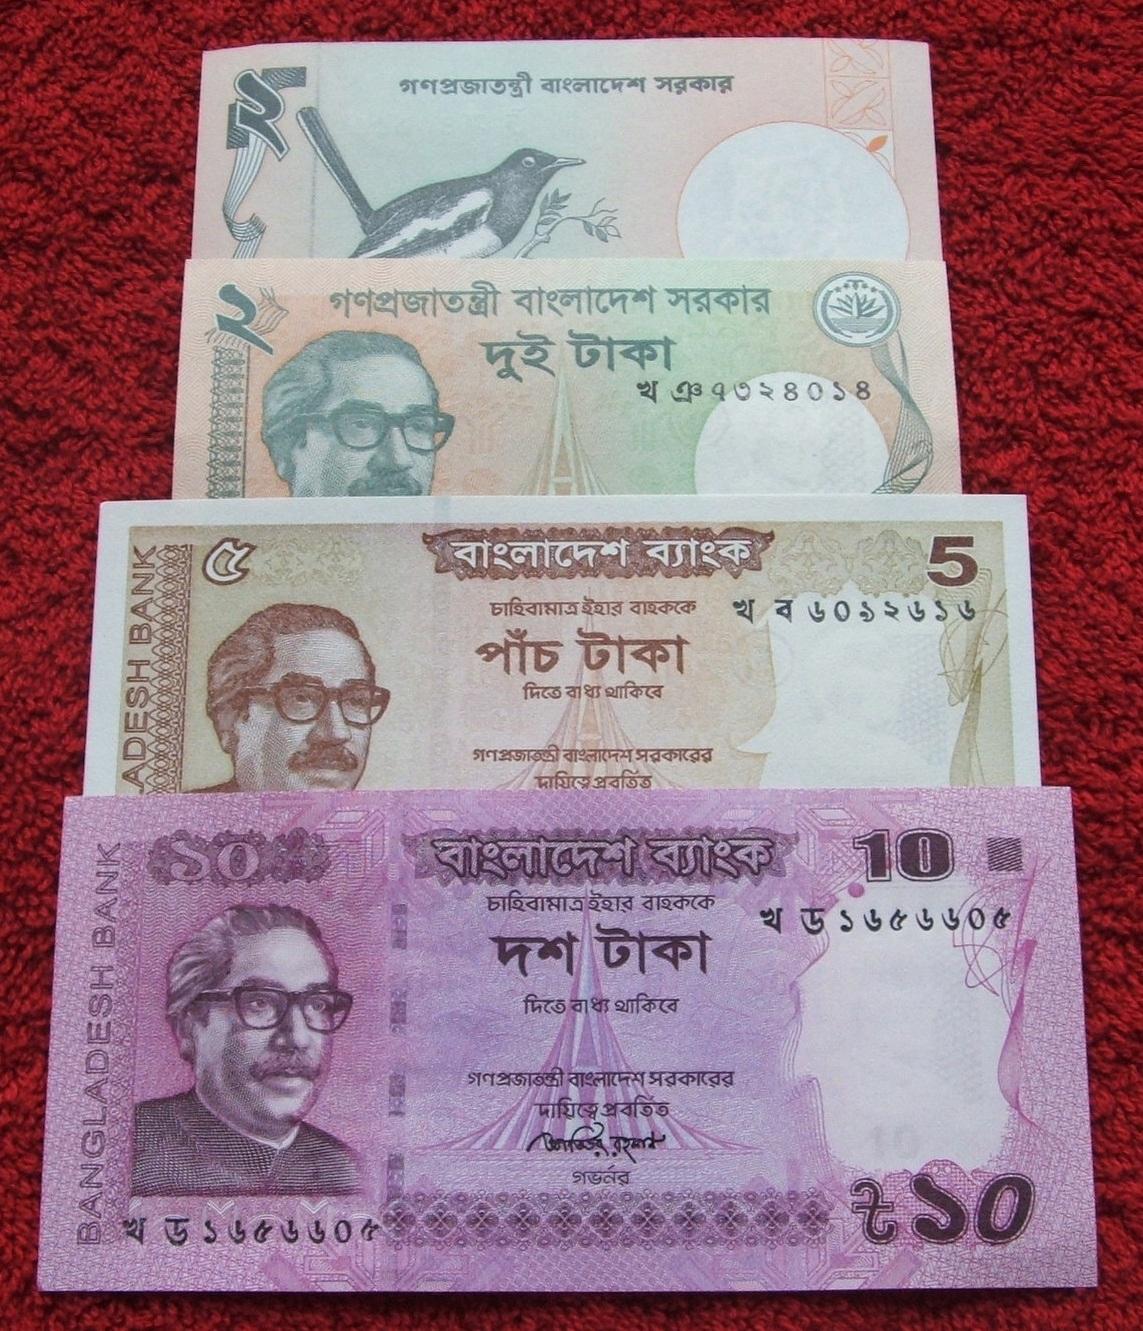 ZESTAW BANKNOTÓW BANGLADESZ !!! STAN UNC !!! SUPER